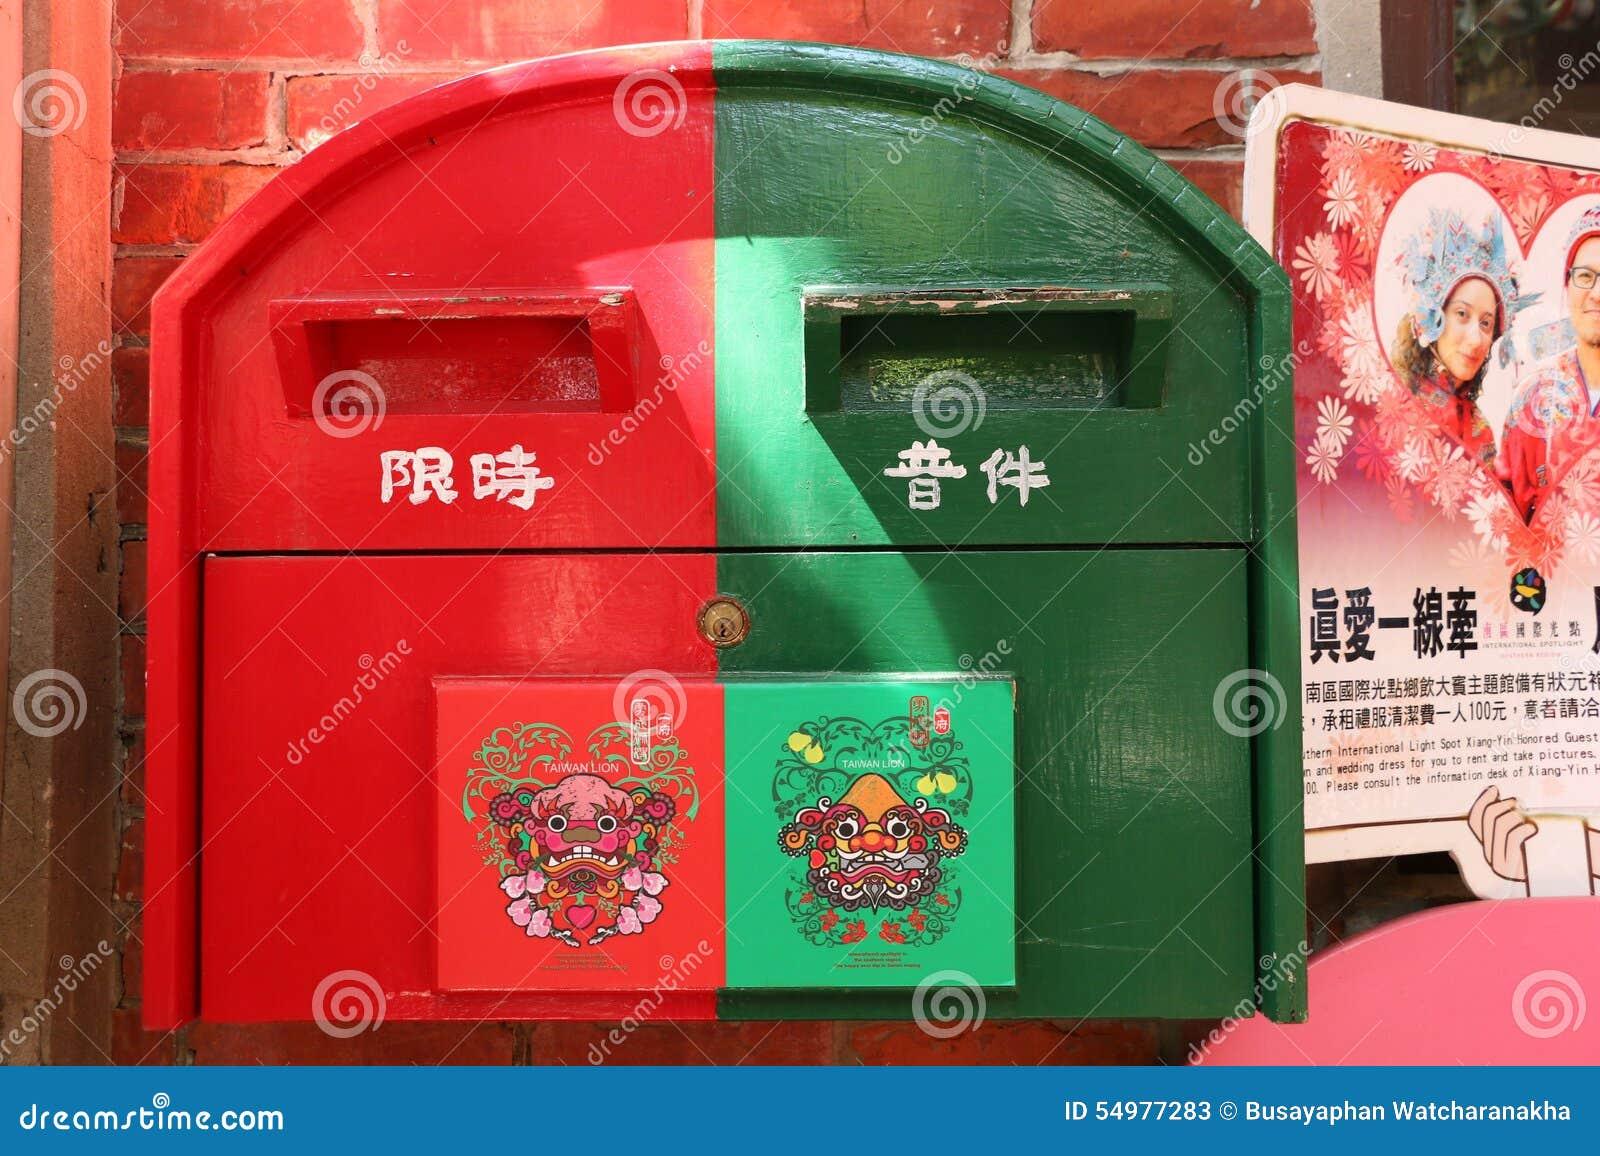 ANPING TAIWAN - APRIL 14, 2015